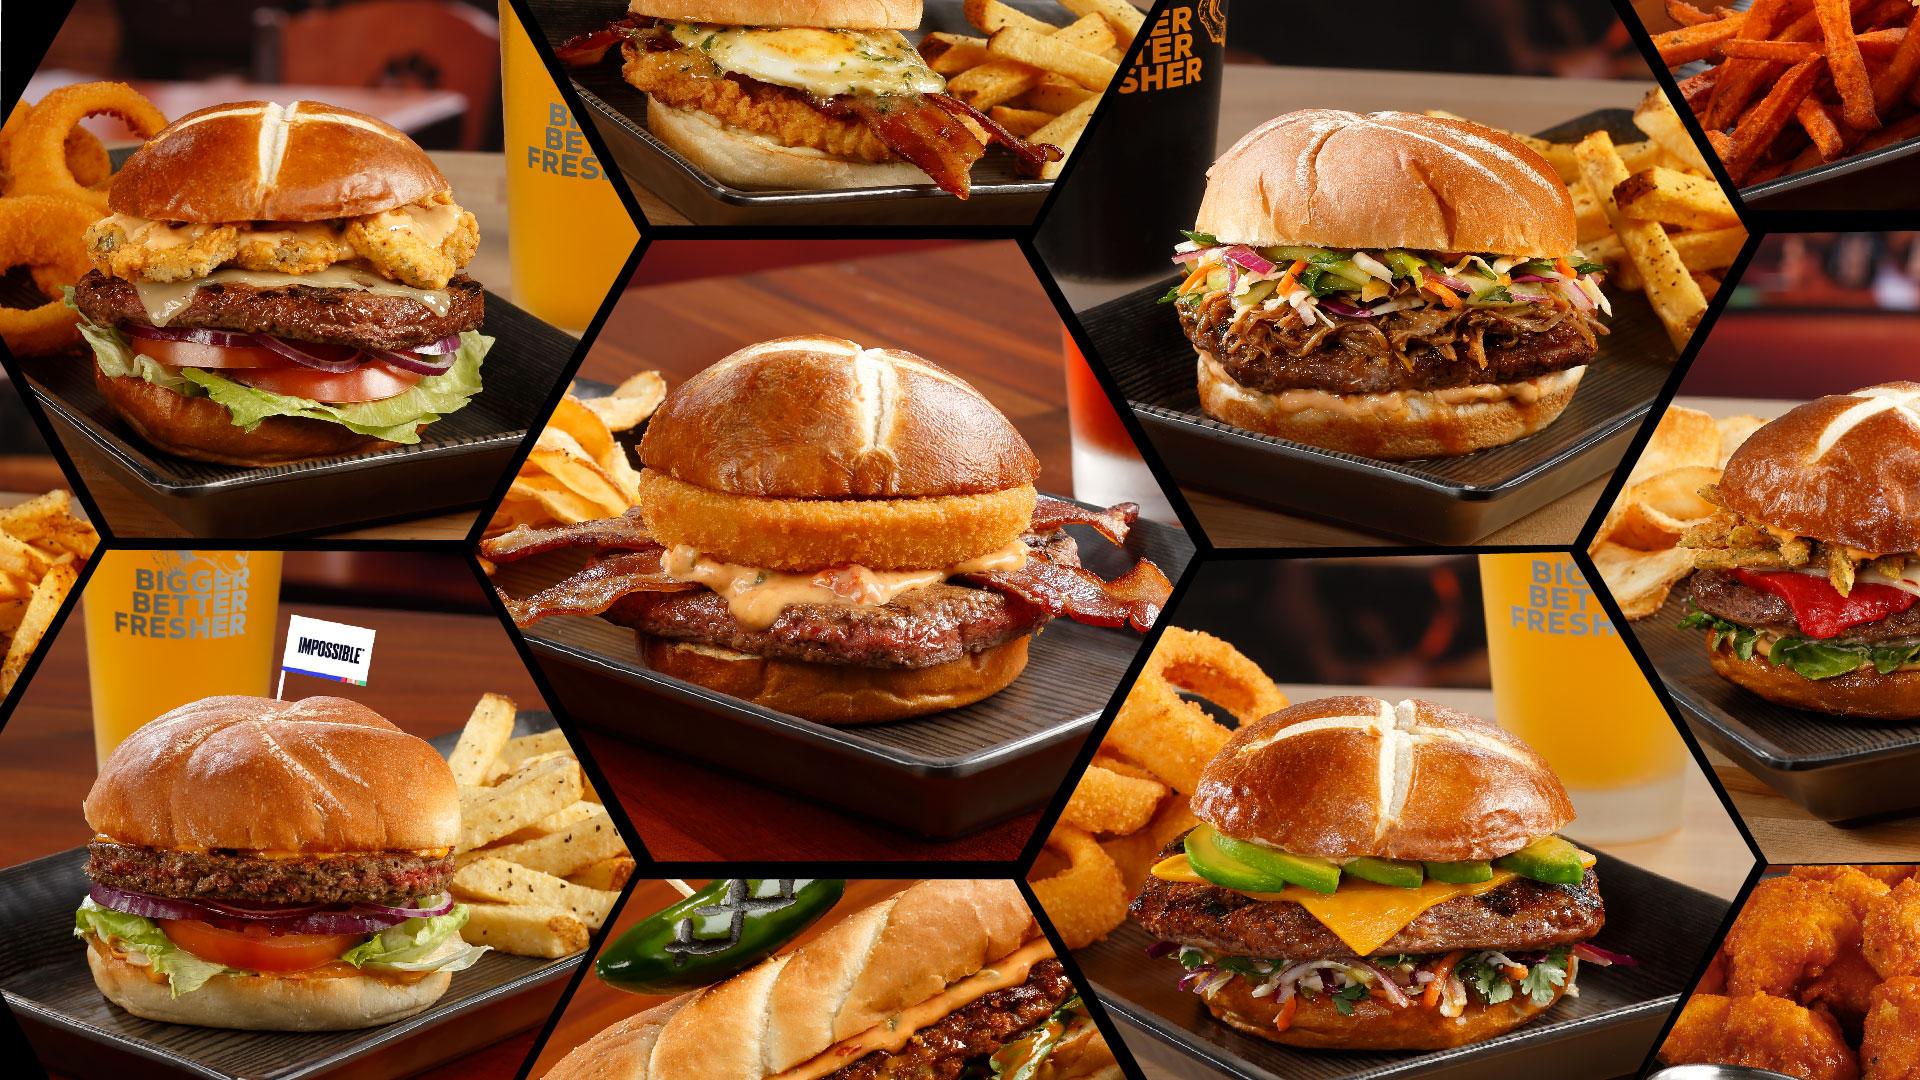 burgerama mosaic of various burgers